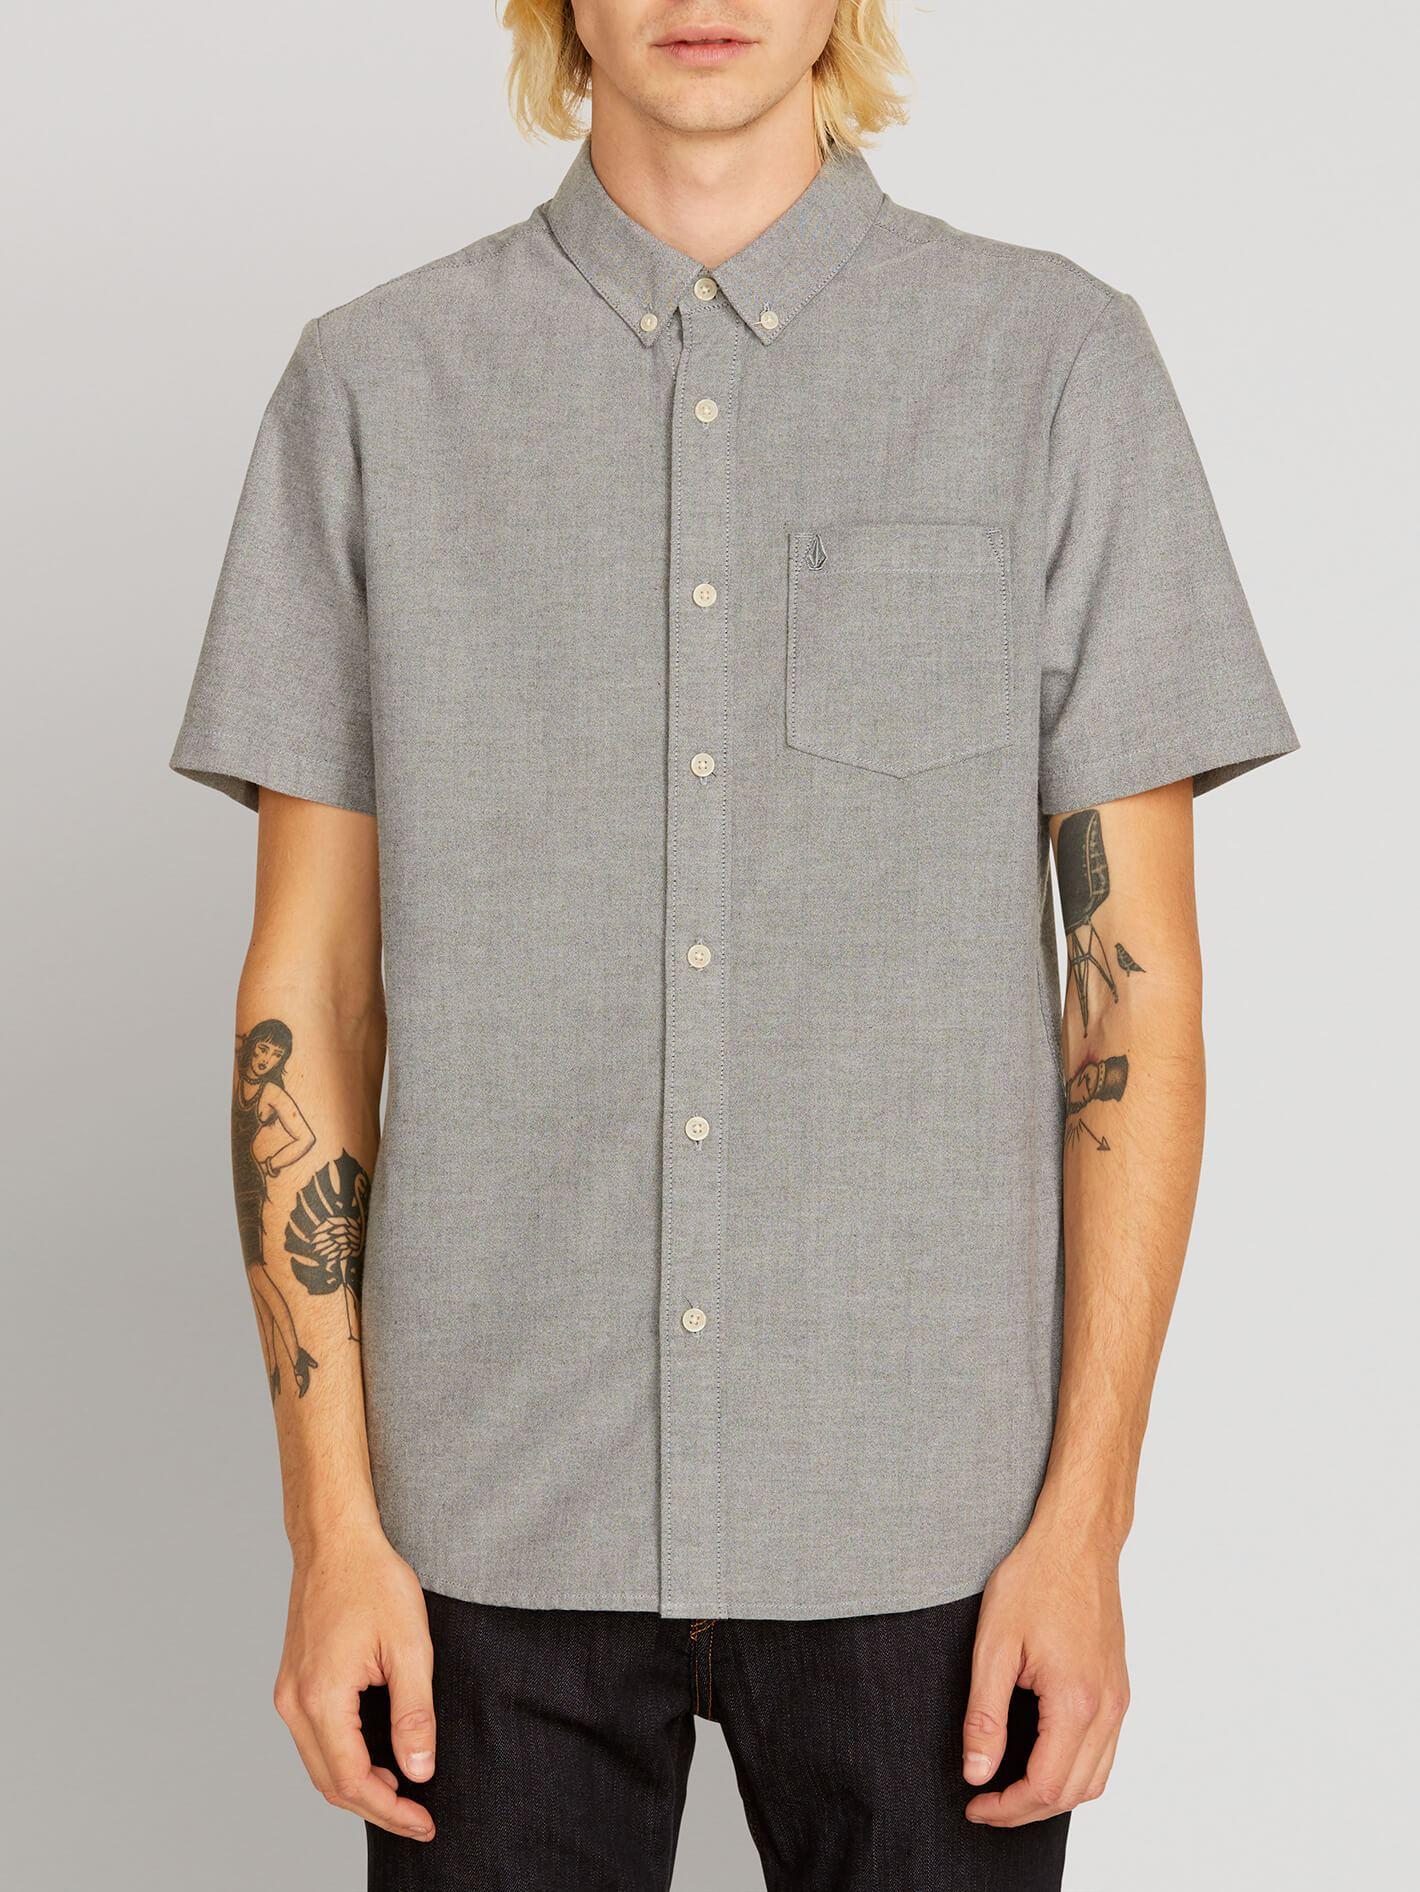 Everett Oxford Short Sleeve Shirt - Black - BLACK / XL